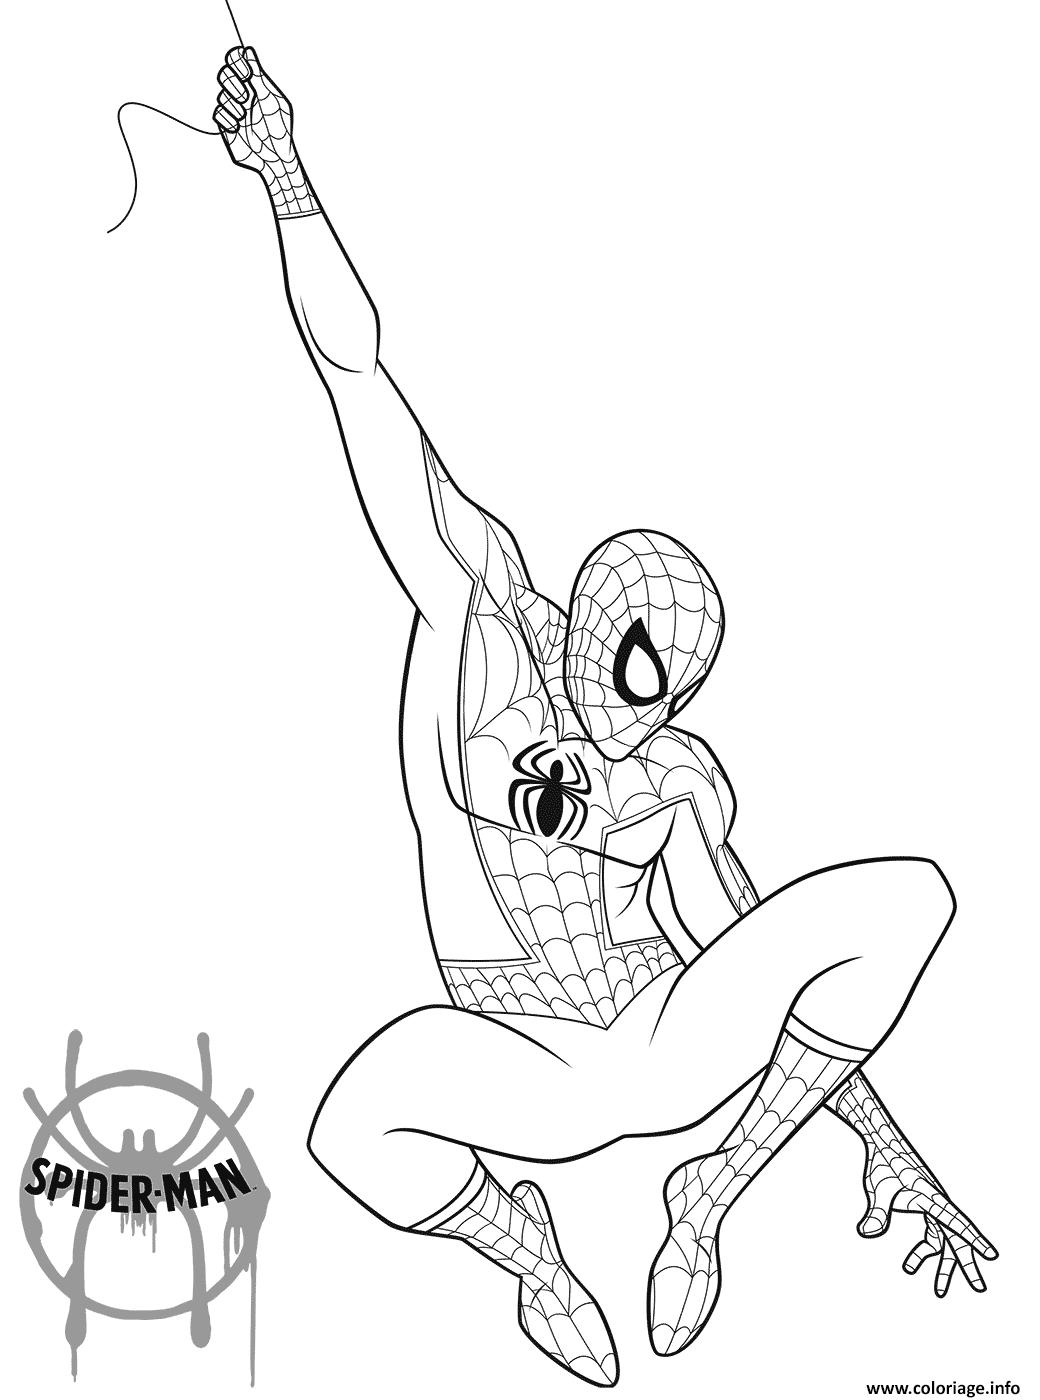 Coloriage Spider Cochon.Coloriage Spider Man 2018 Jecolorie Com